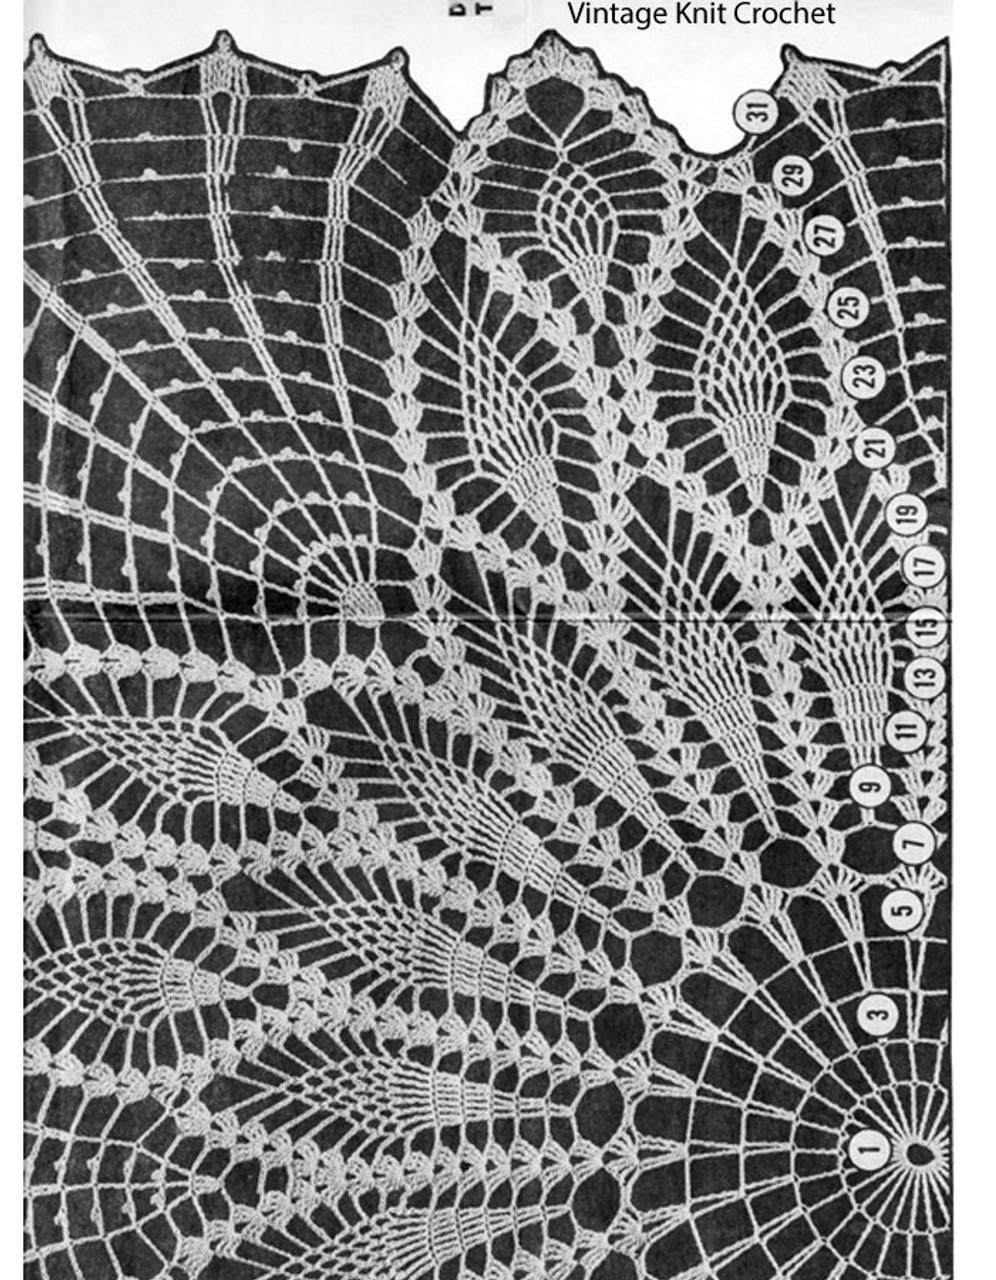 Pineapple Centerpiece Doily Pattern Illustration, Mail Order 7043